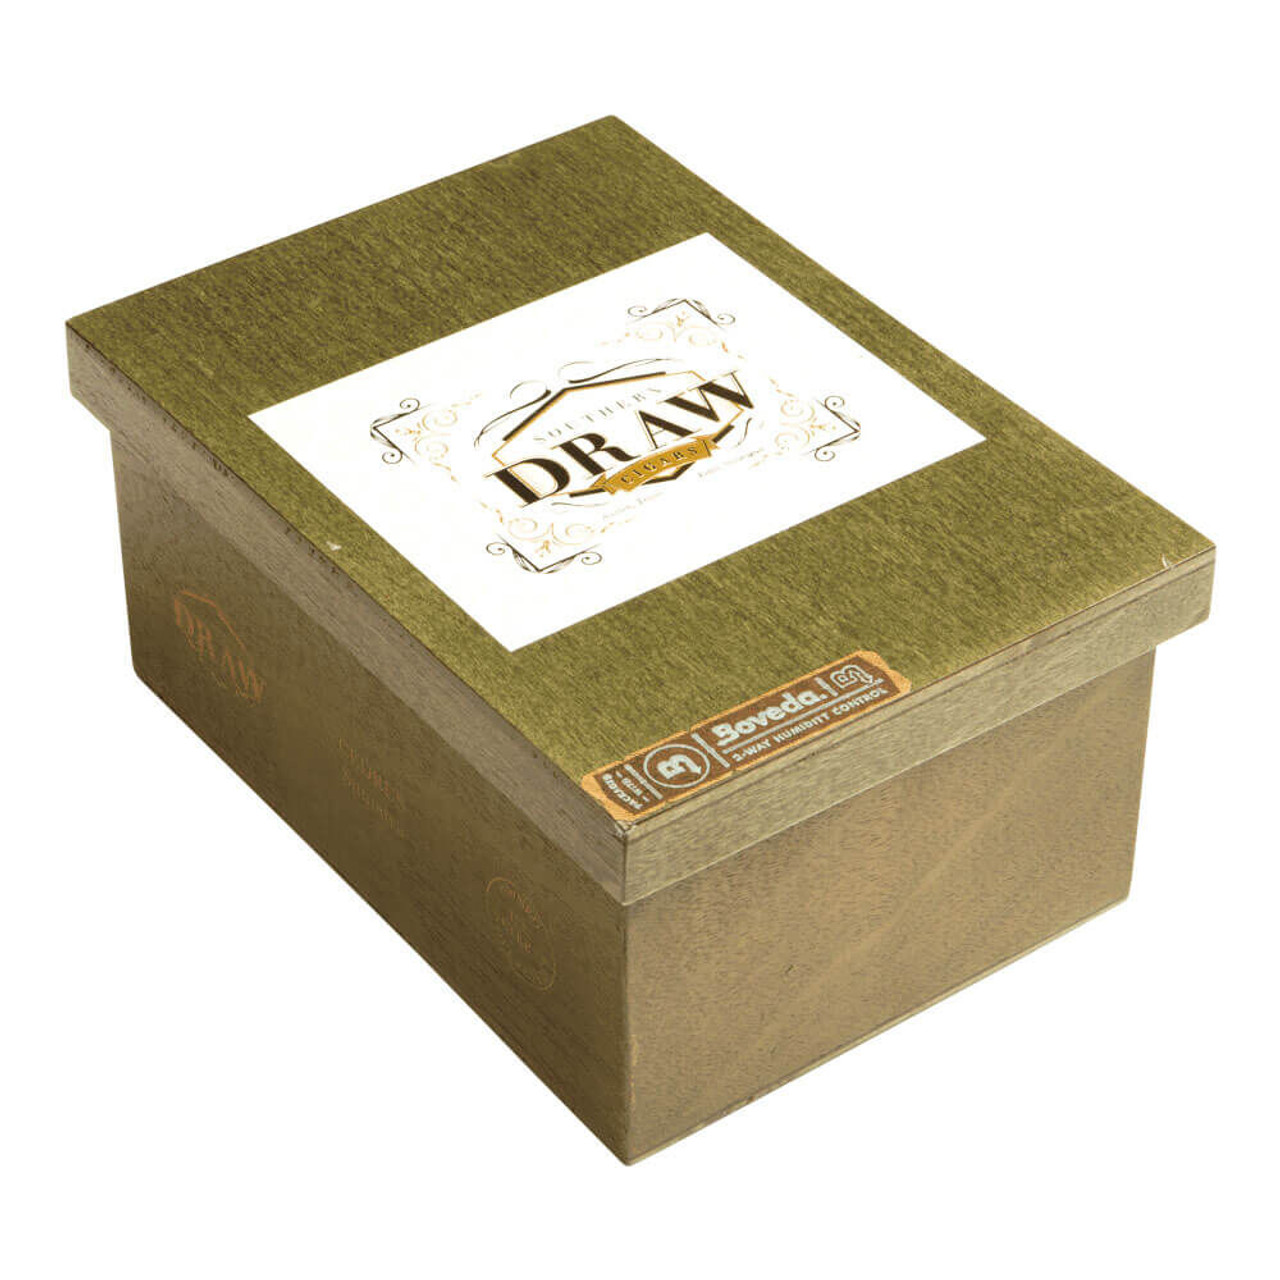 Southern Draw Cedrus Gordo Cigars - 6 x 60 (Box of 20)